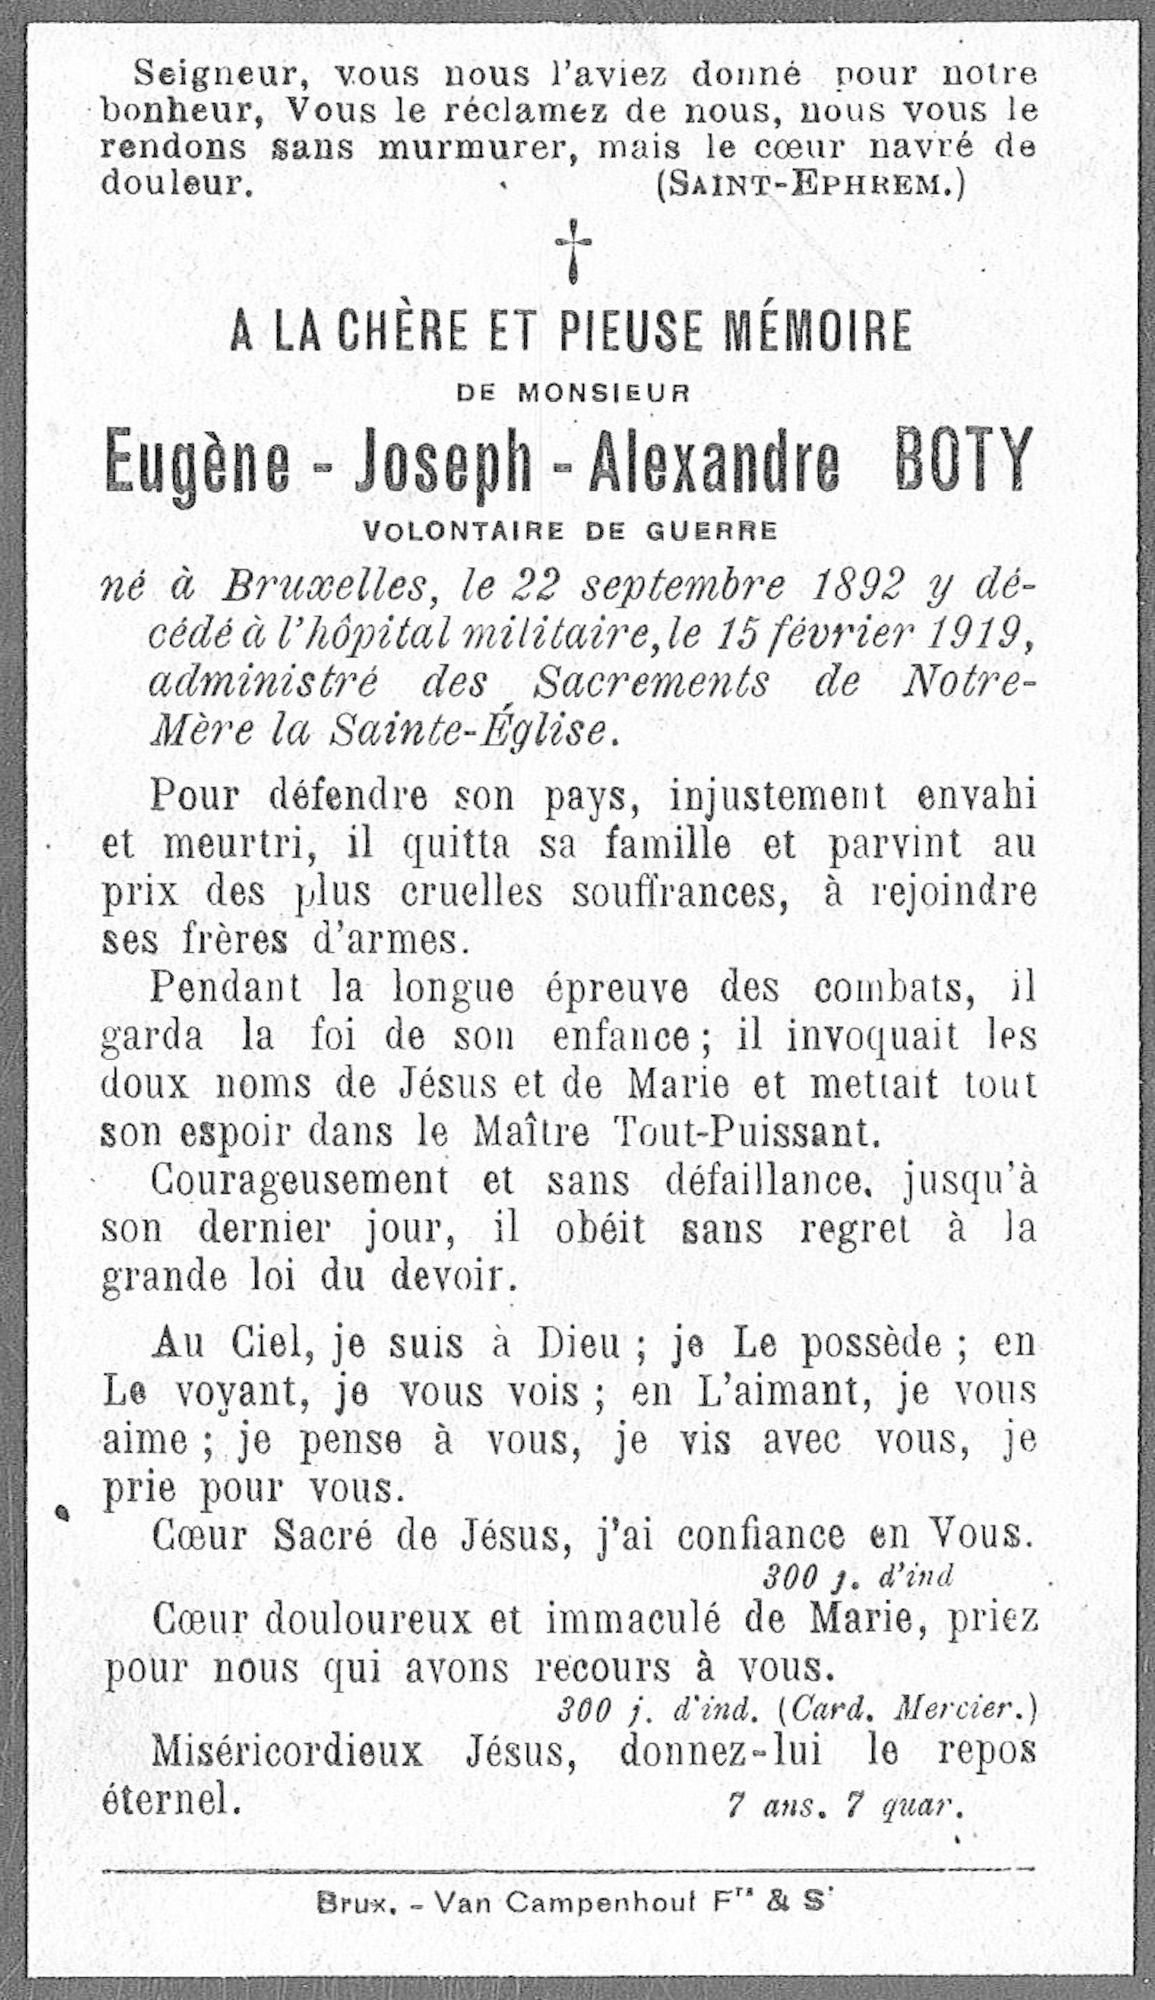 Eugène-Joseph-ALexandre Boty